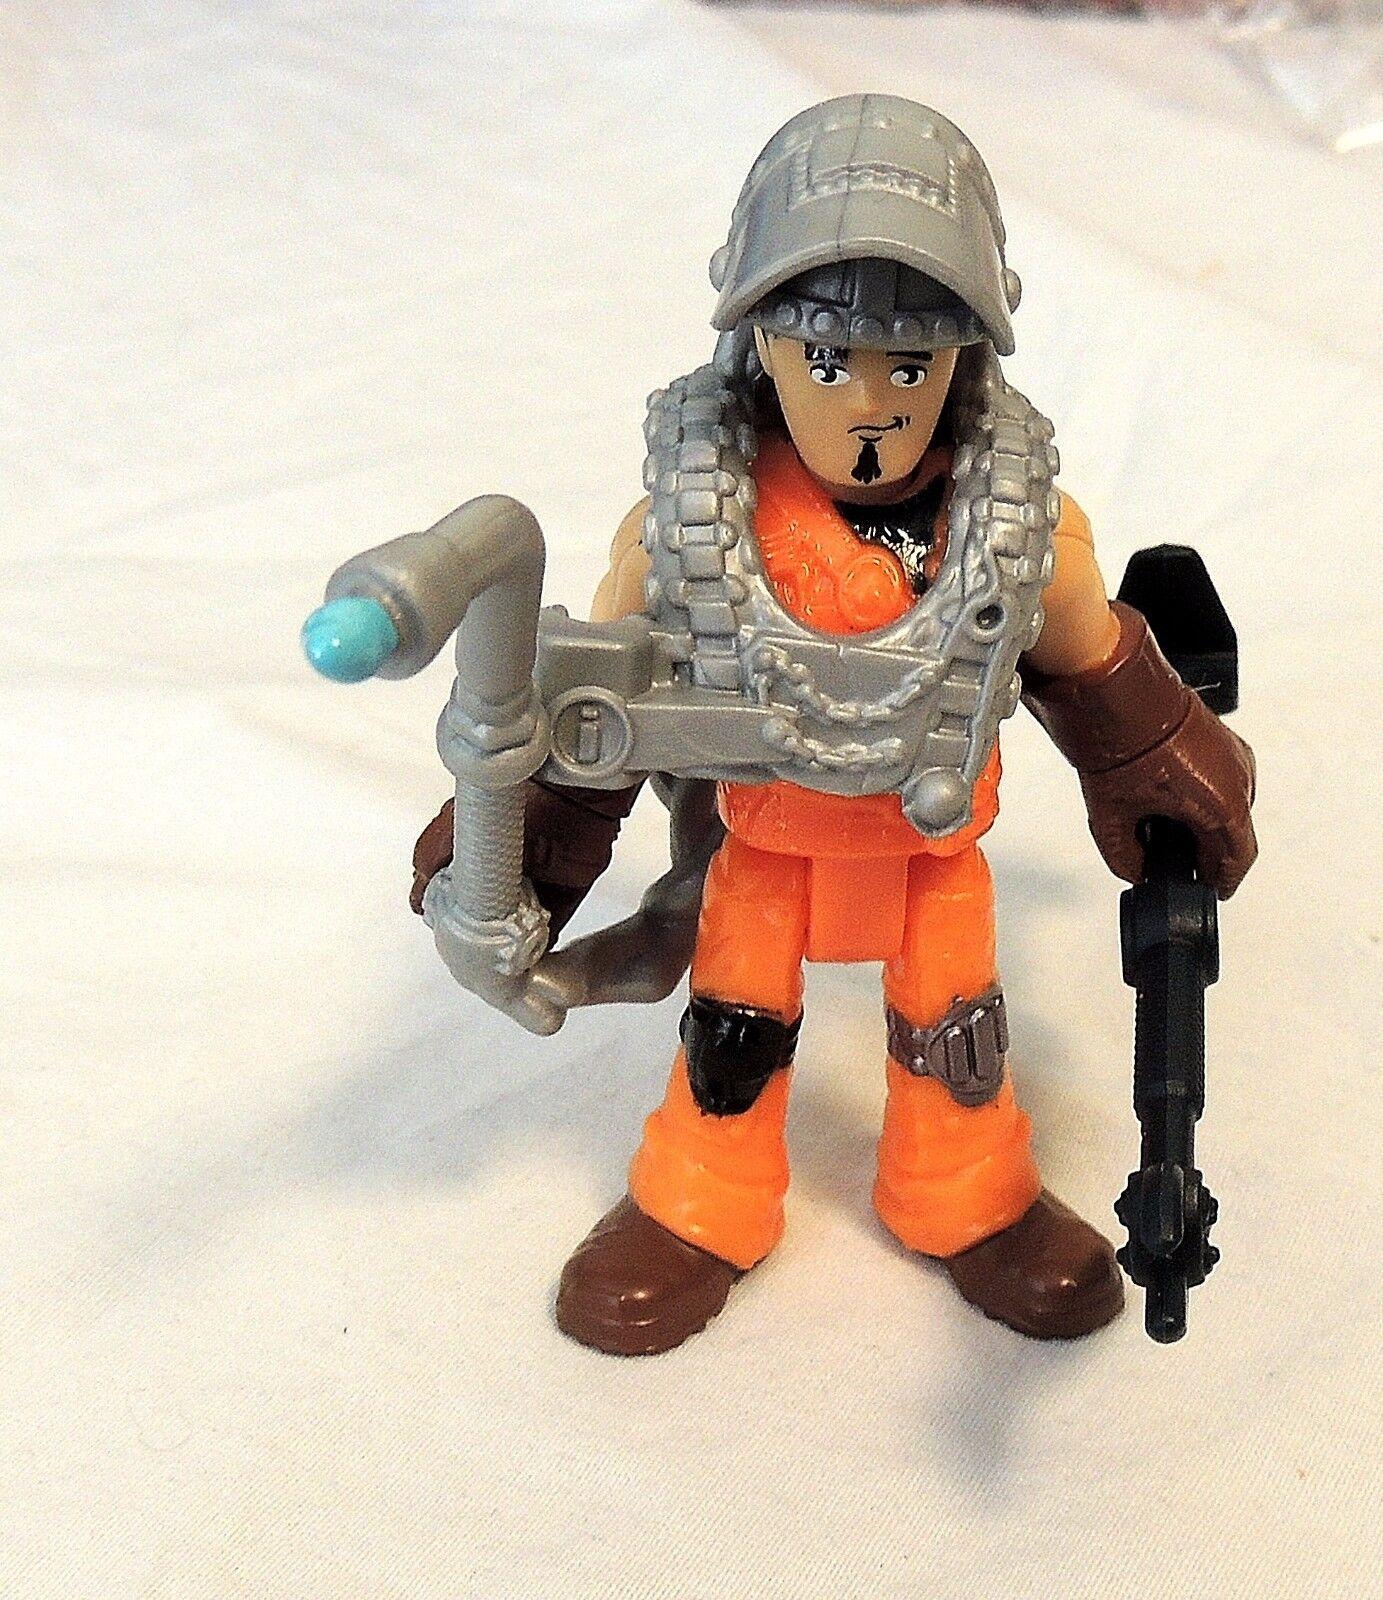 New Imaginext, Blind Bag Series 8 Figure Welder Construction Blow Torch